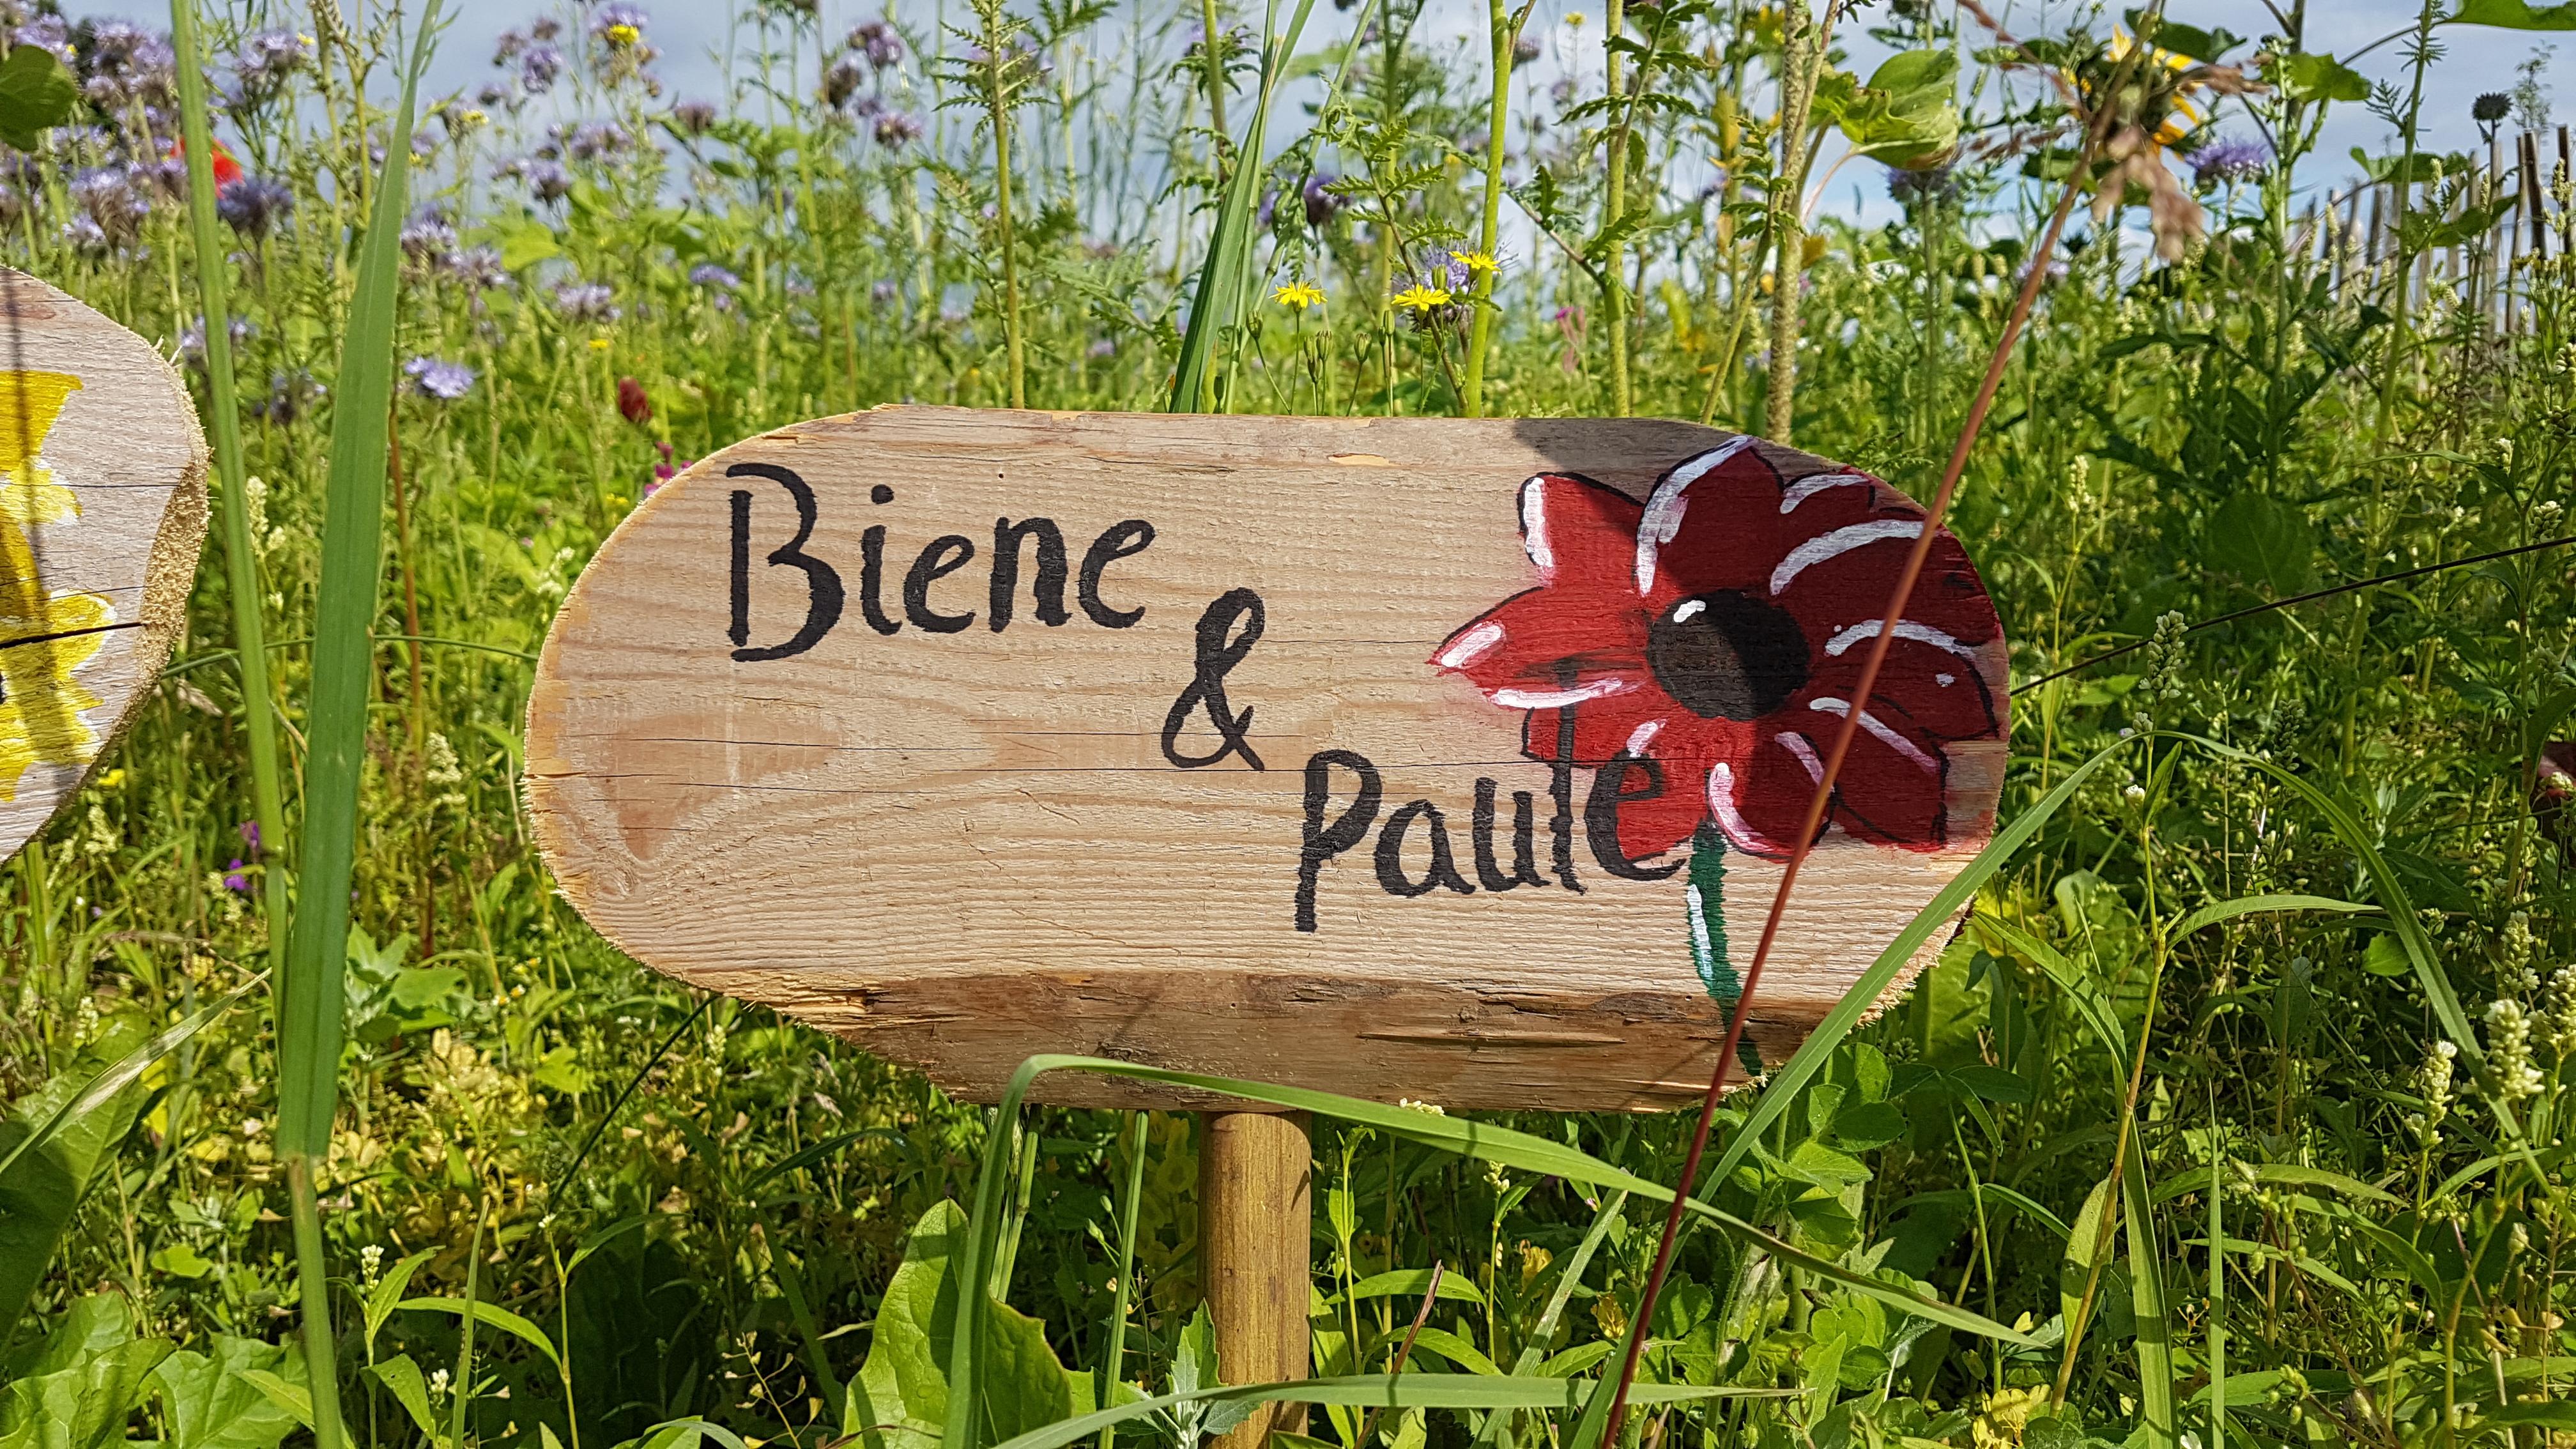 Biene Paul